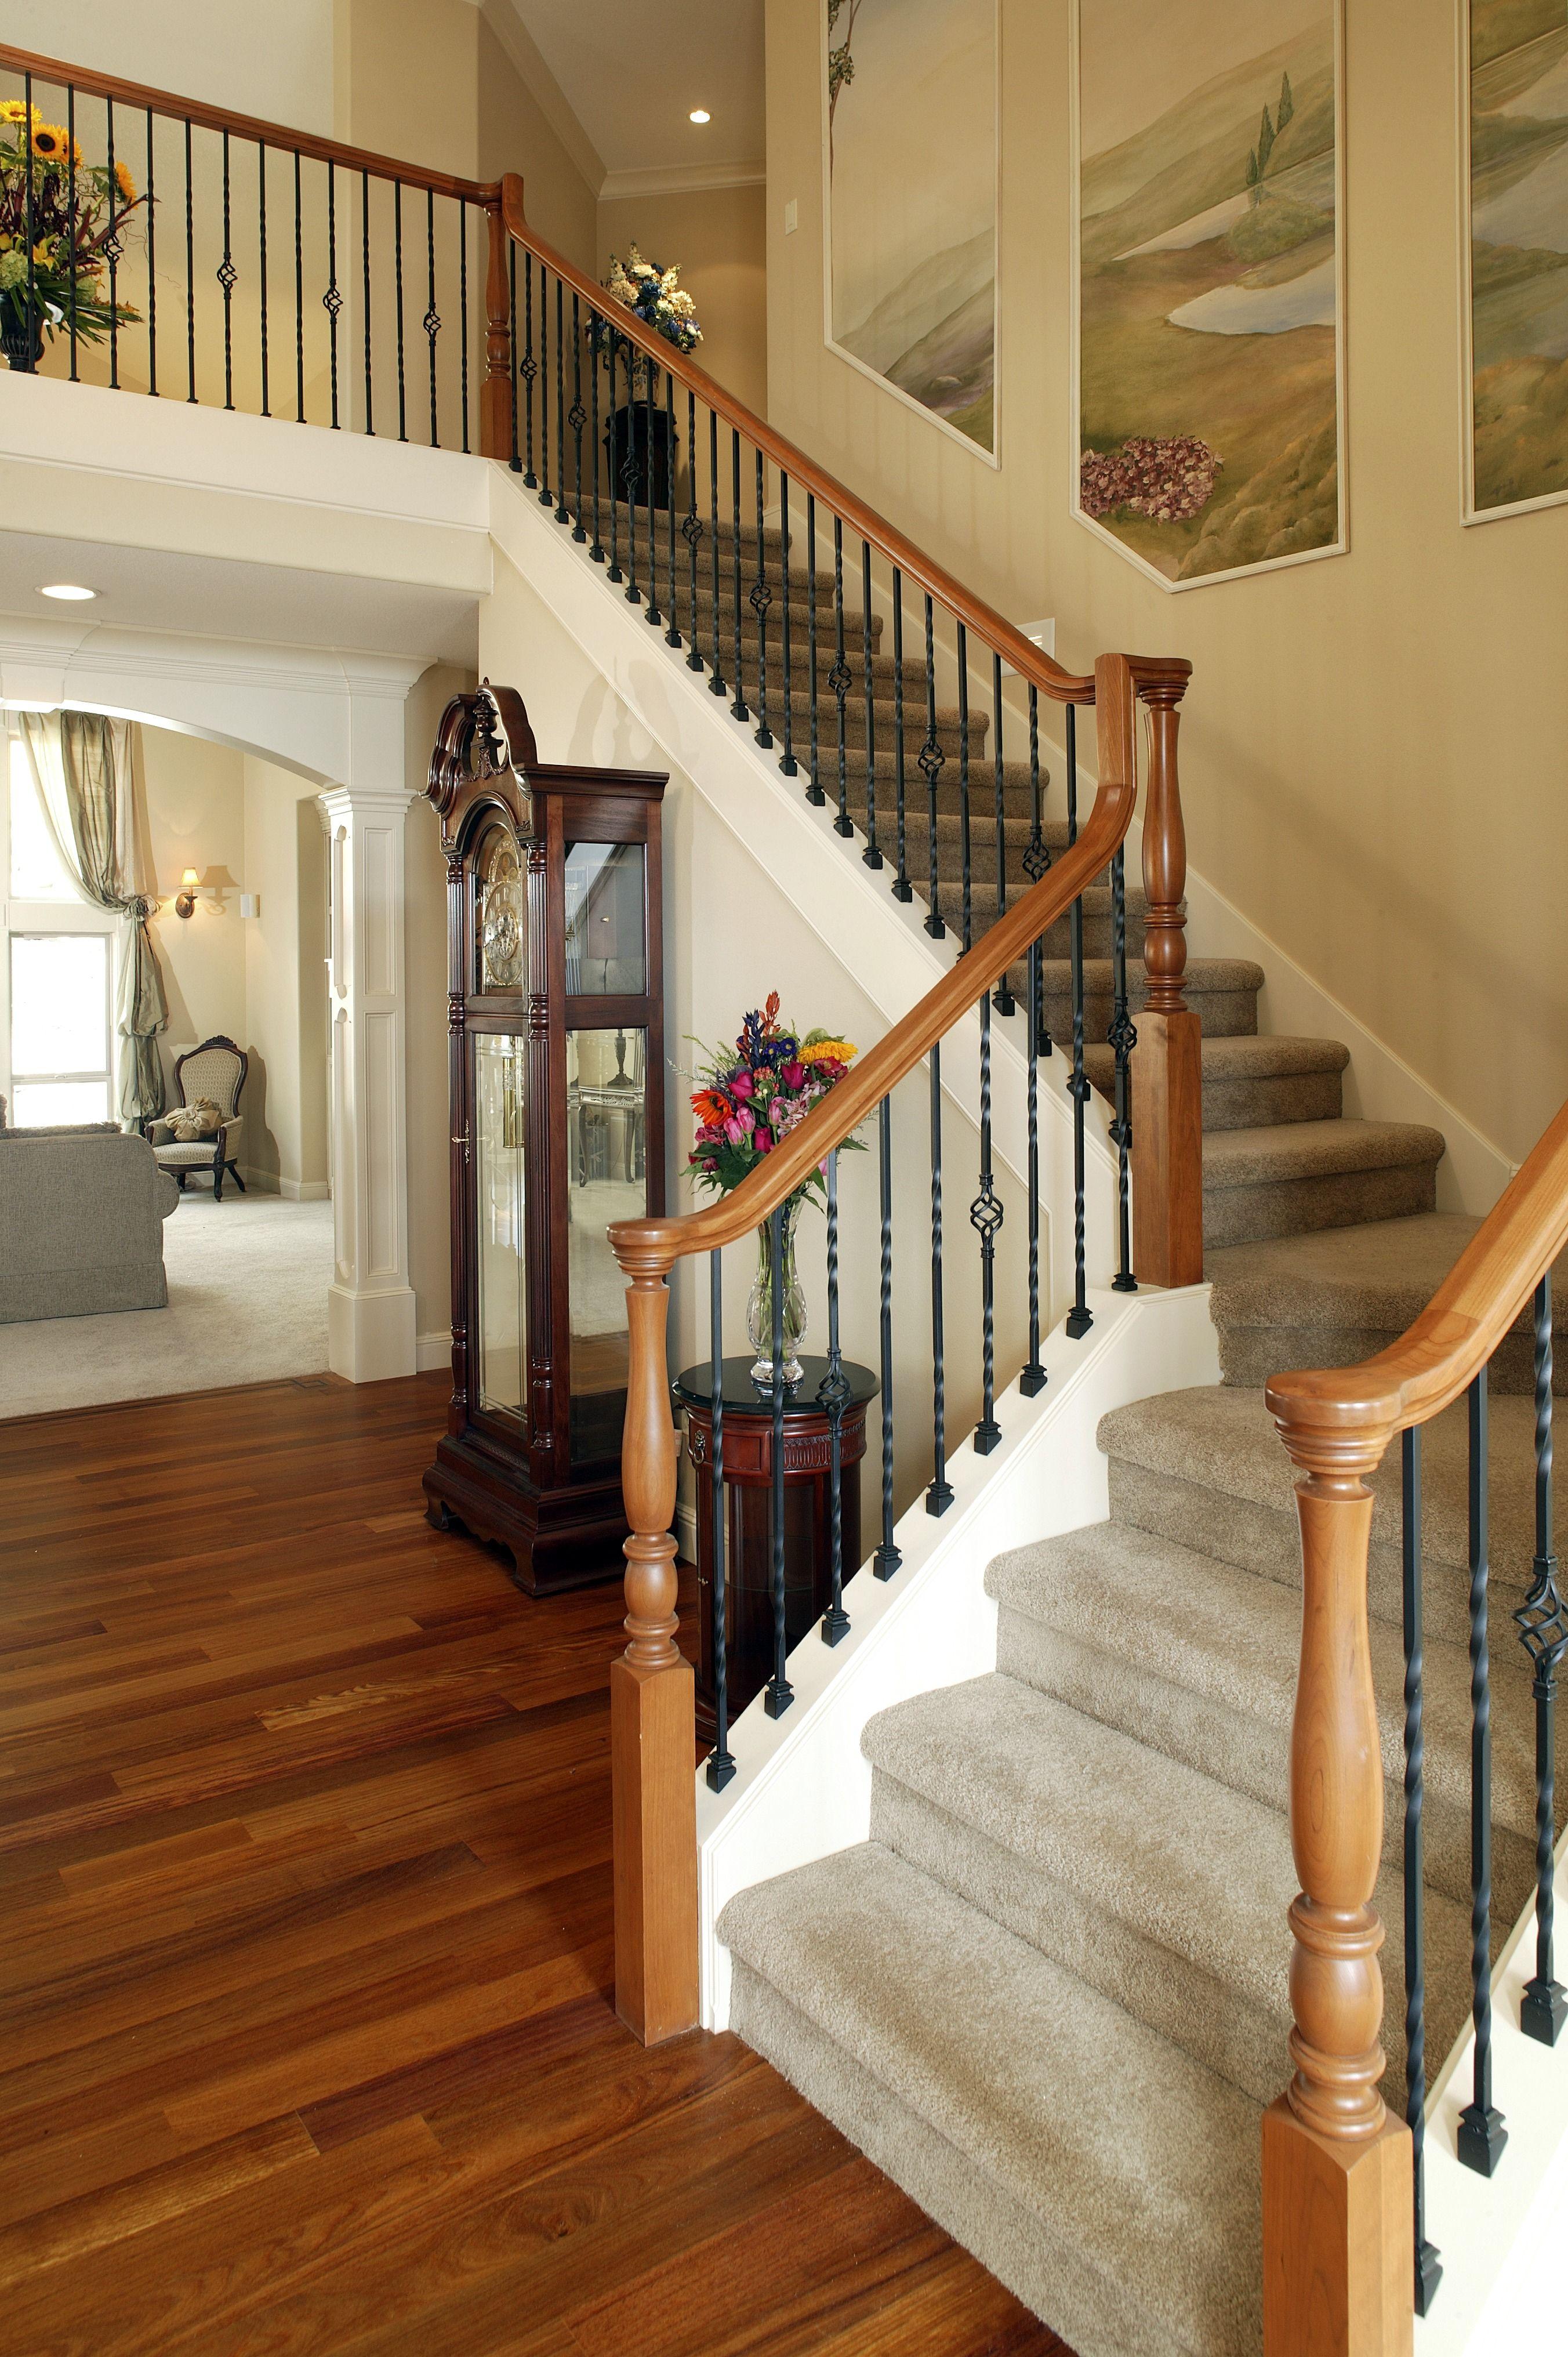 How to refinish hardwood floors grandfather clock dark wood and